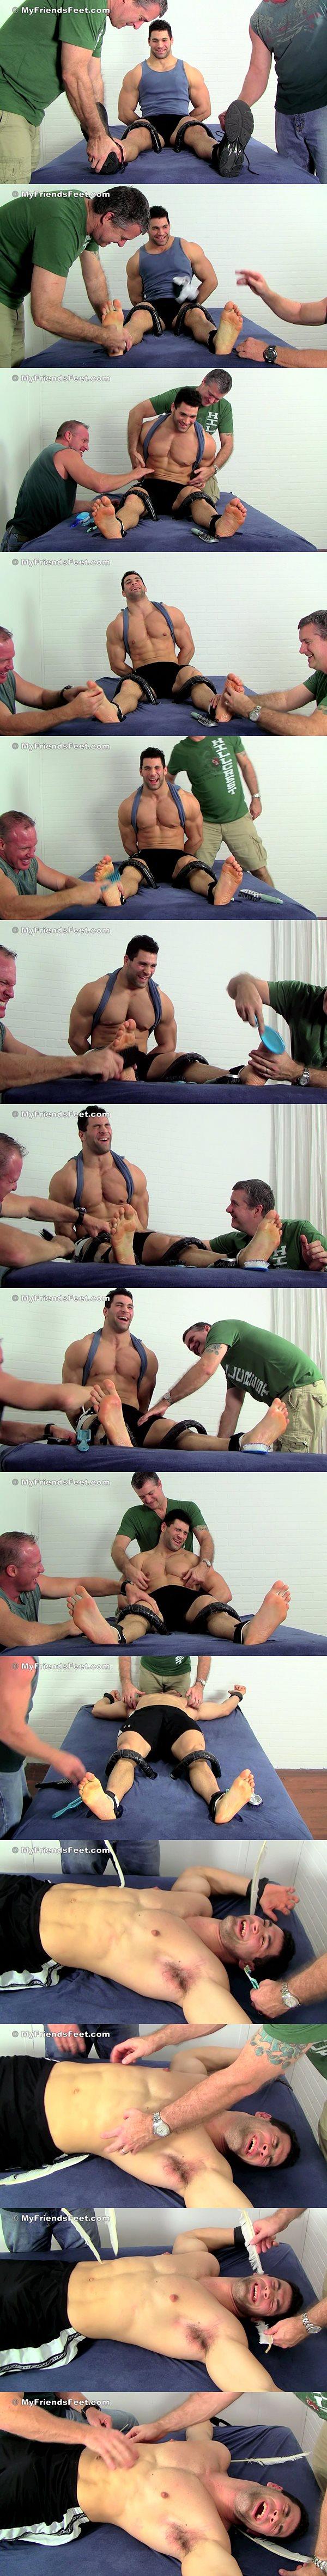 Big muscle hunk Vinnie tickled at Myfriendsfeet